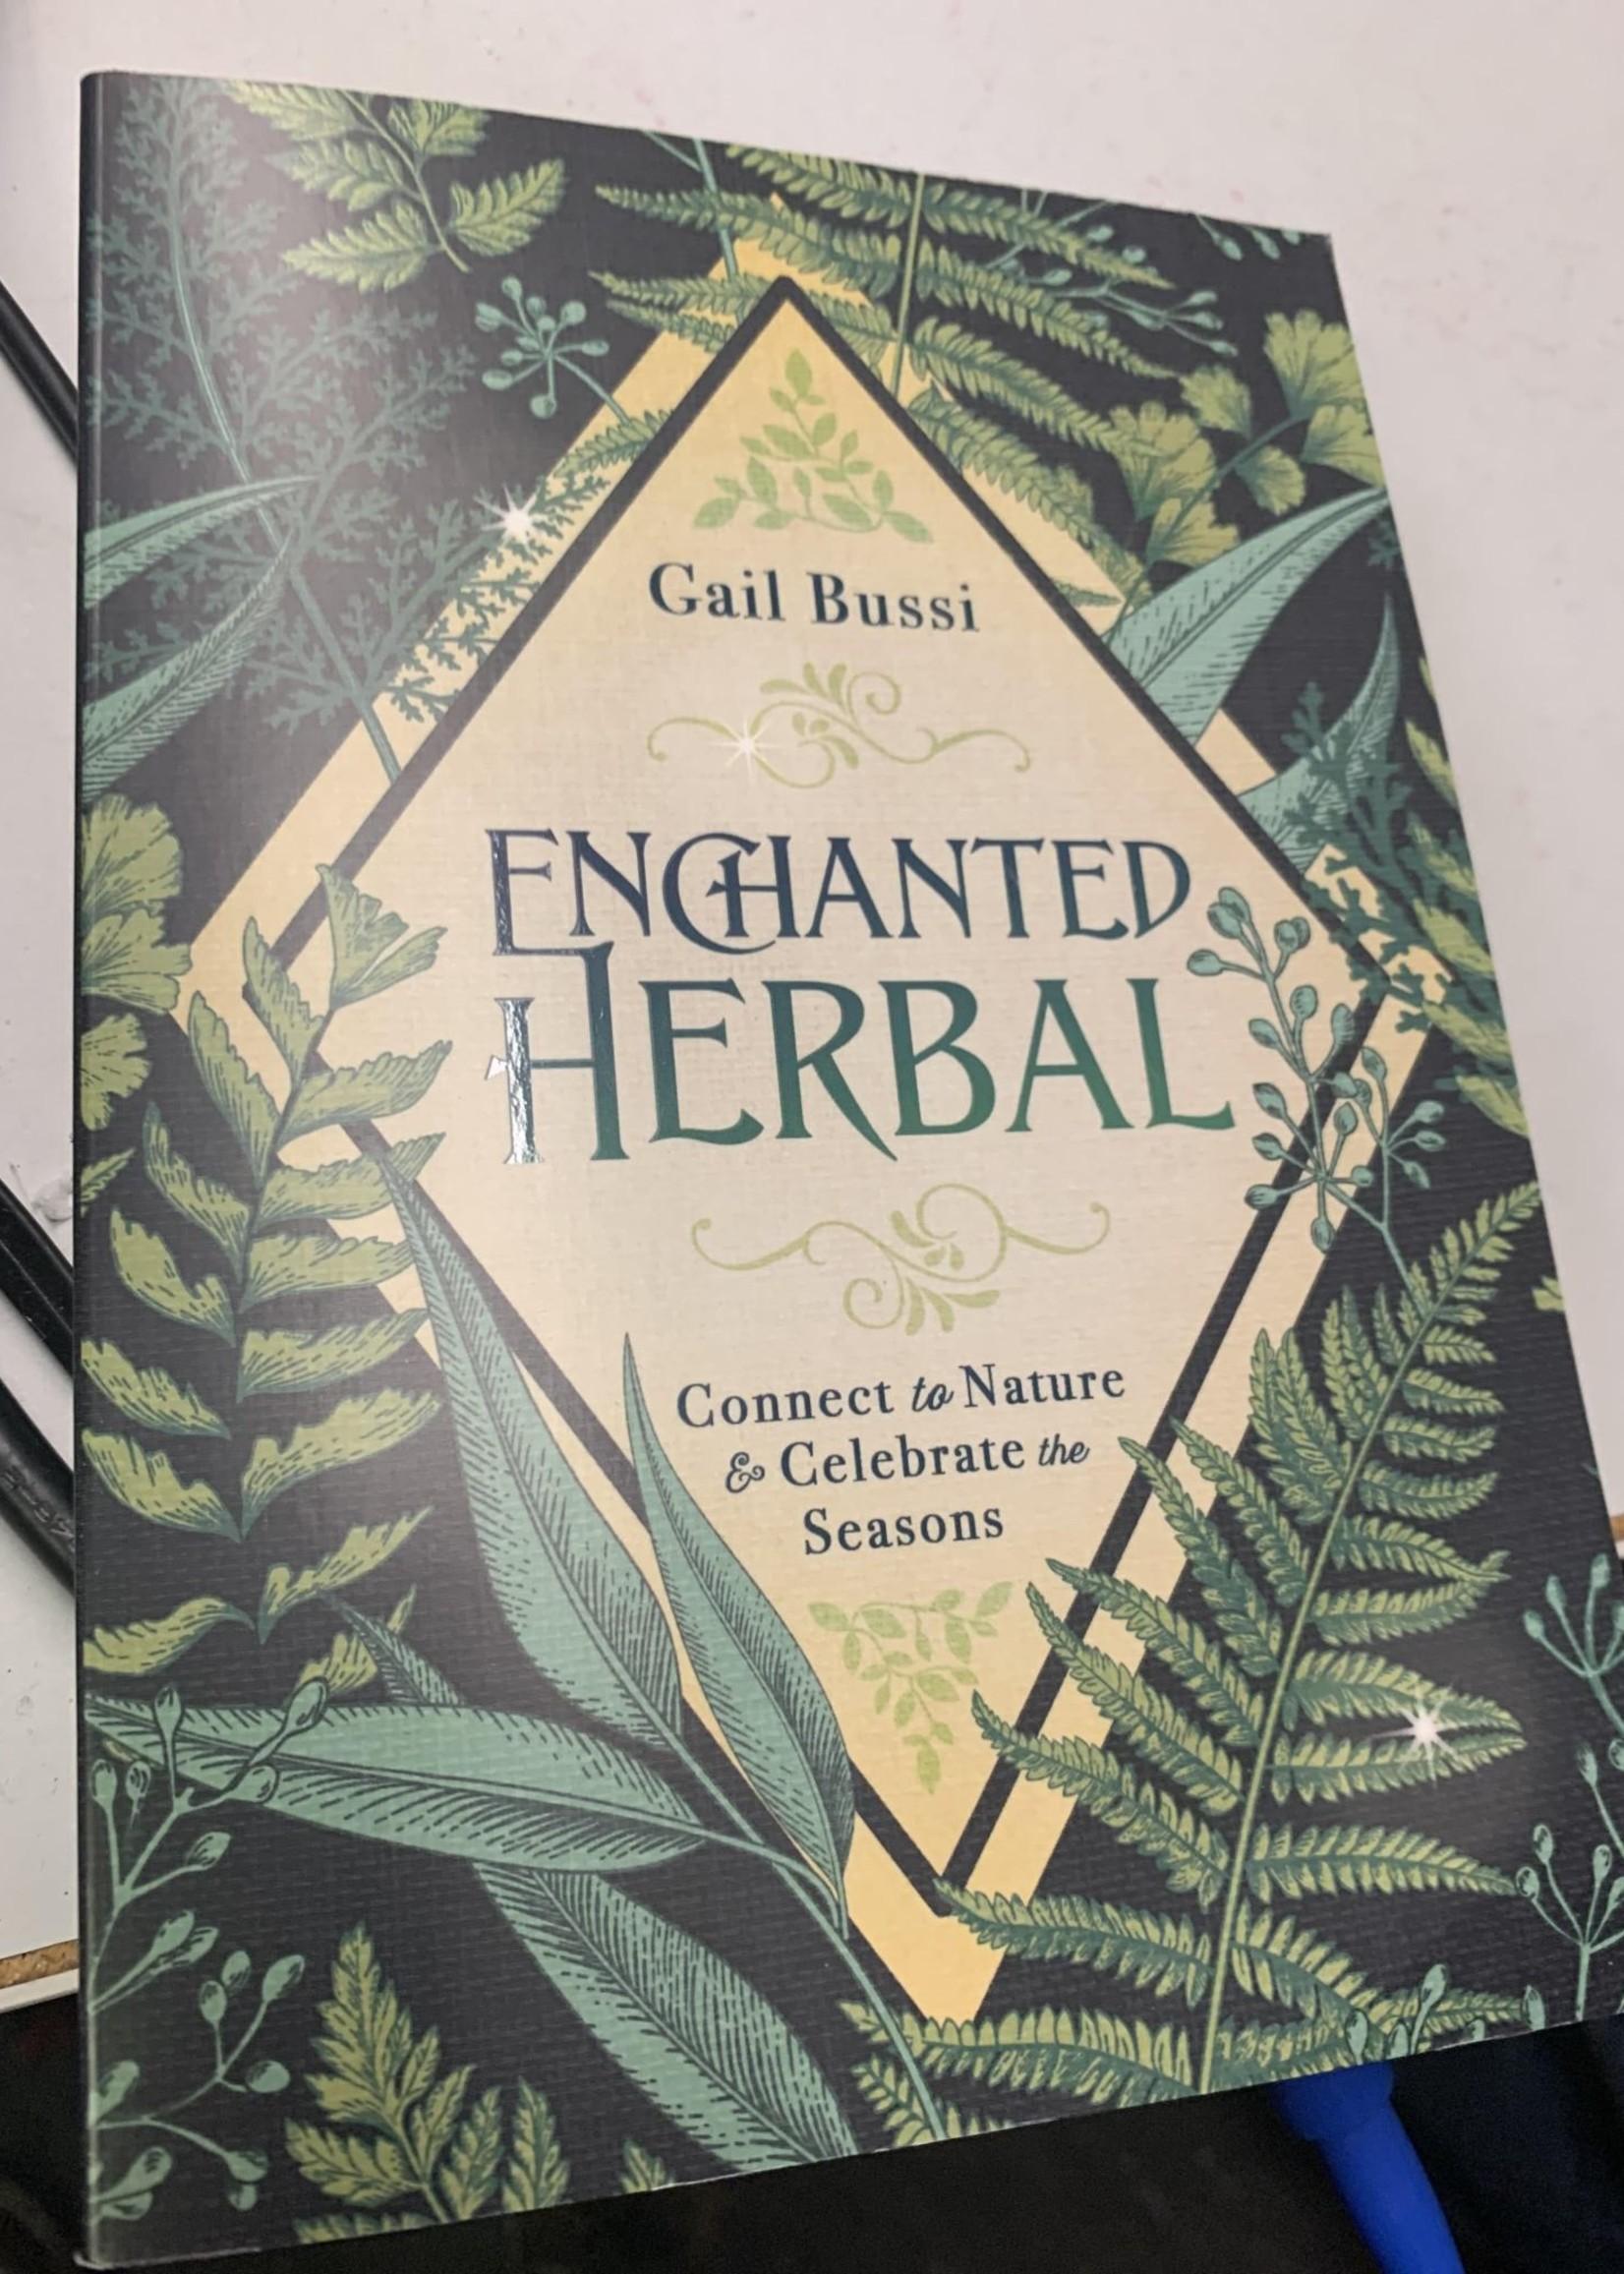 Enchanted Herbal -  BY GAIL BUSSI